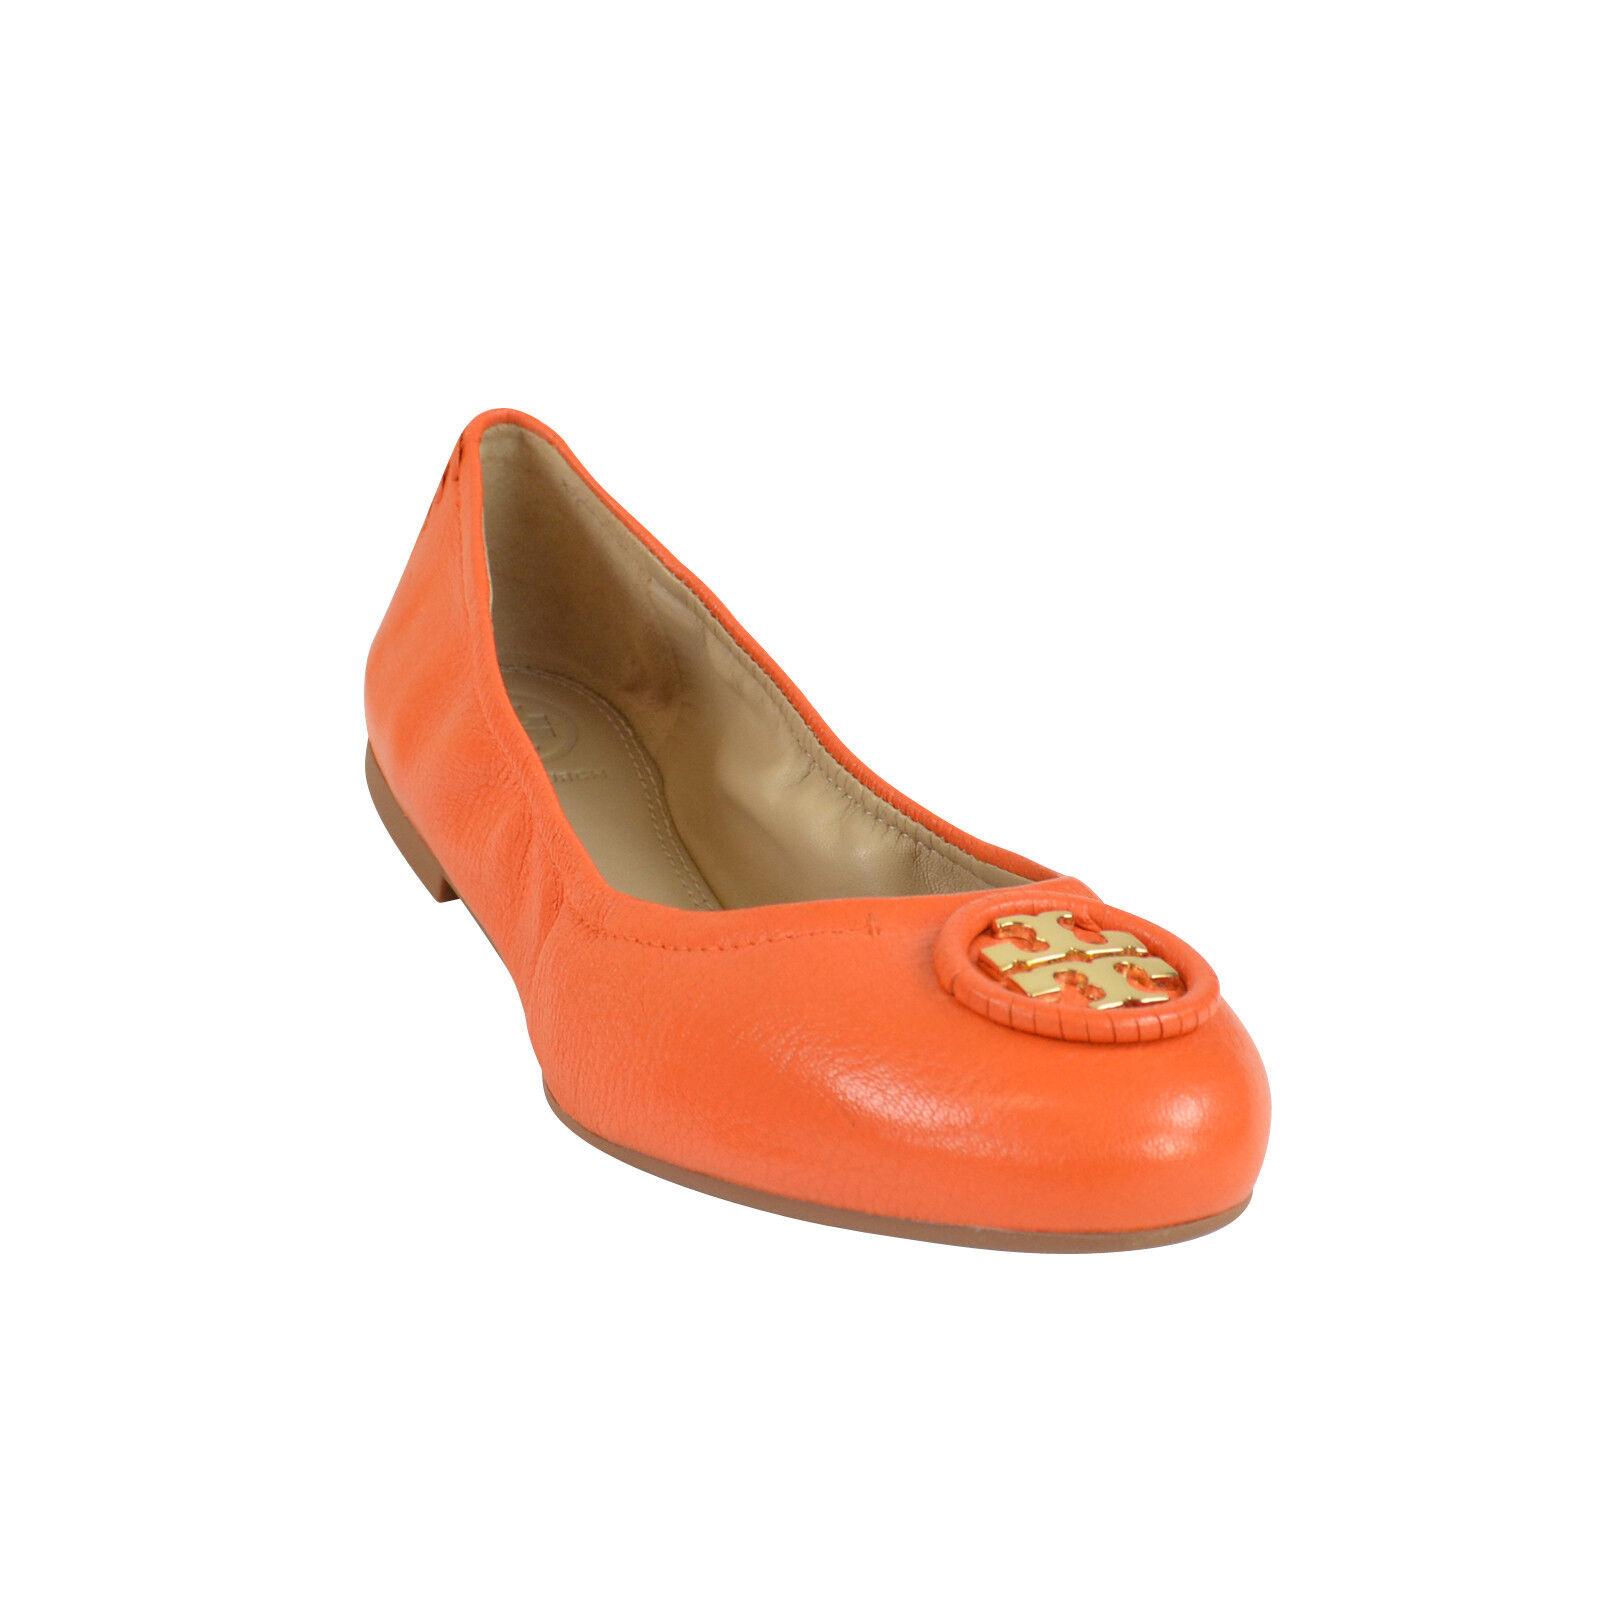 Ritorno di 10 giorni NIB Tory Tory Tory Burch ALLIE Wrapped Logo Ballet Flats scarpe in Mango arancia 9  preferenziale